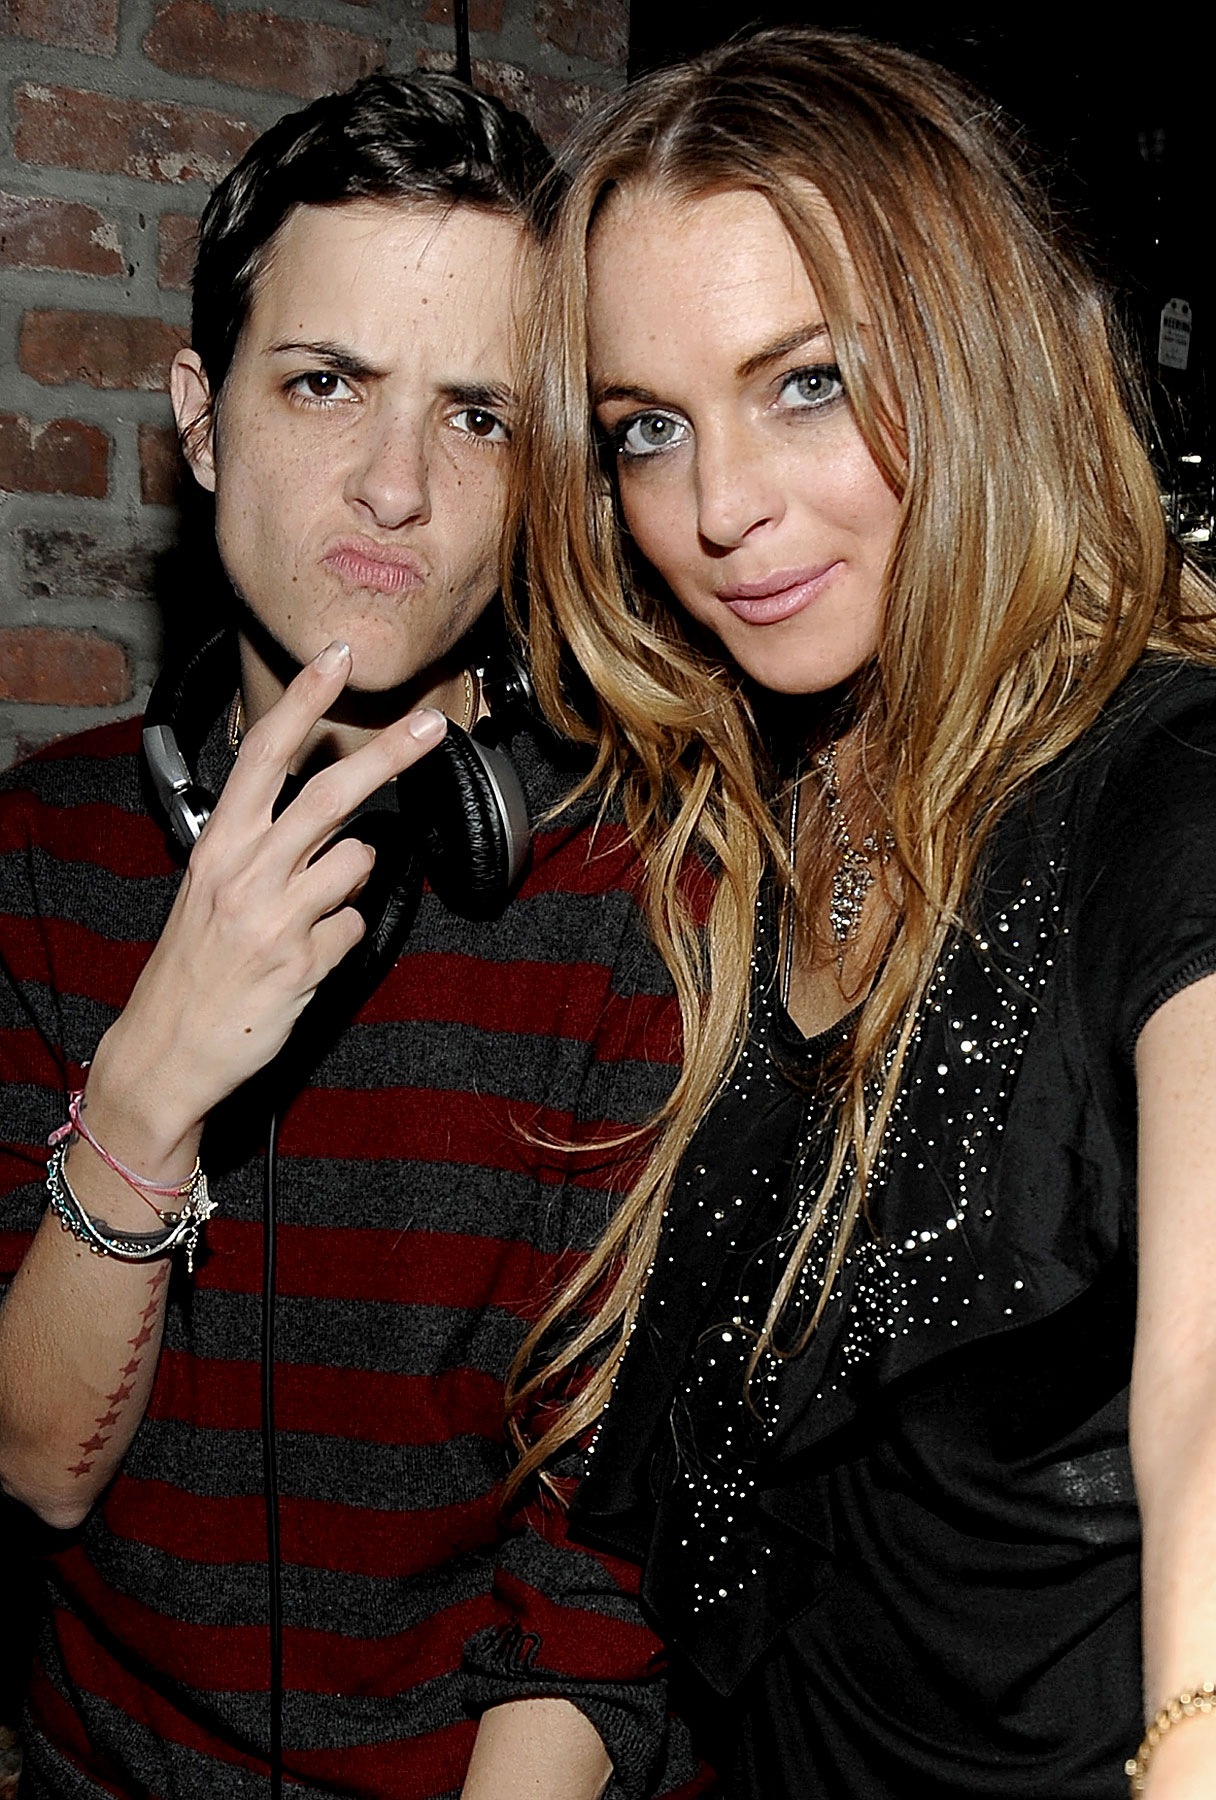 Lindsay Lohan Re-Affirms Her Relationship With Sam